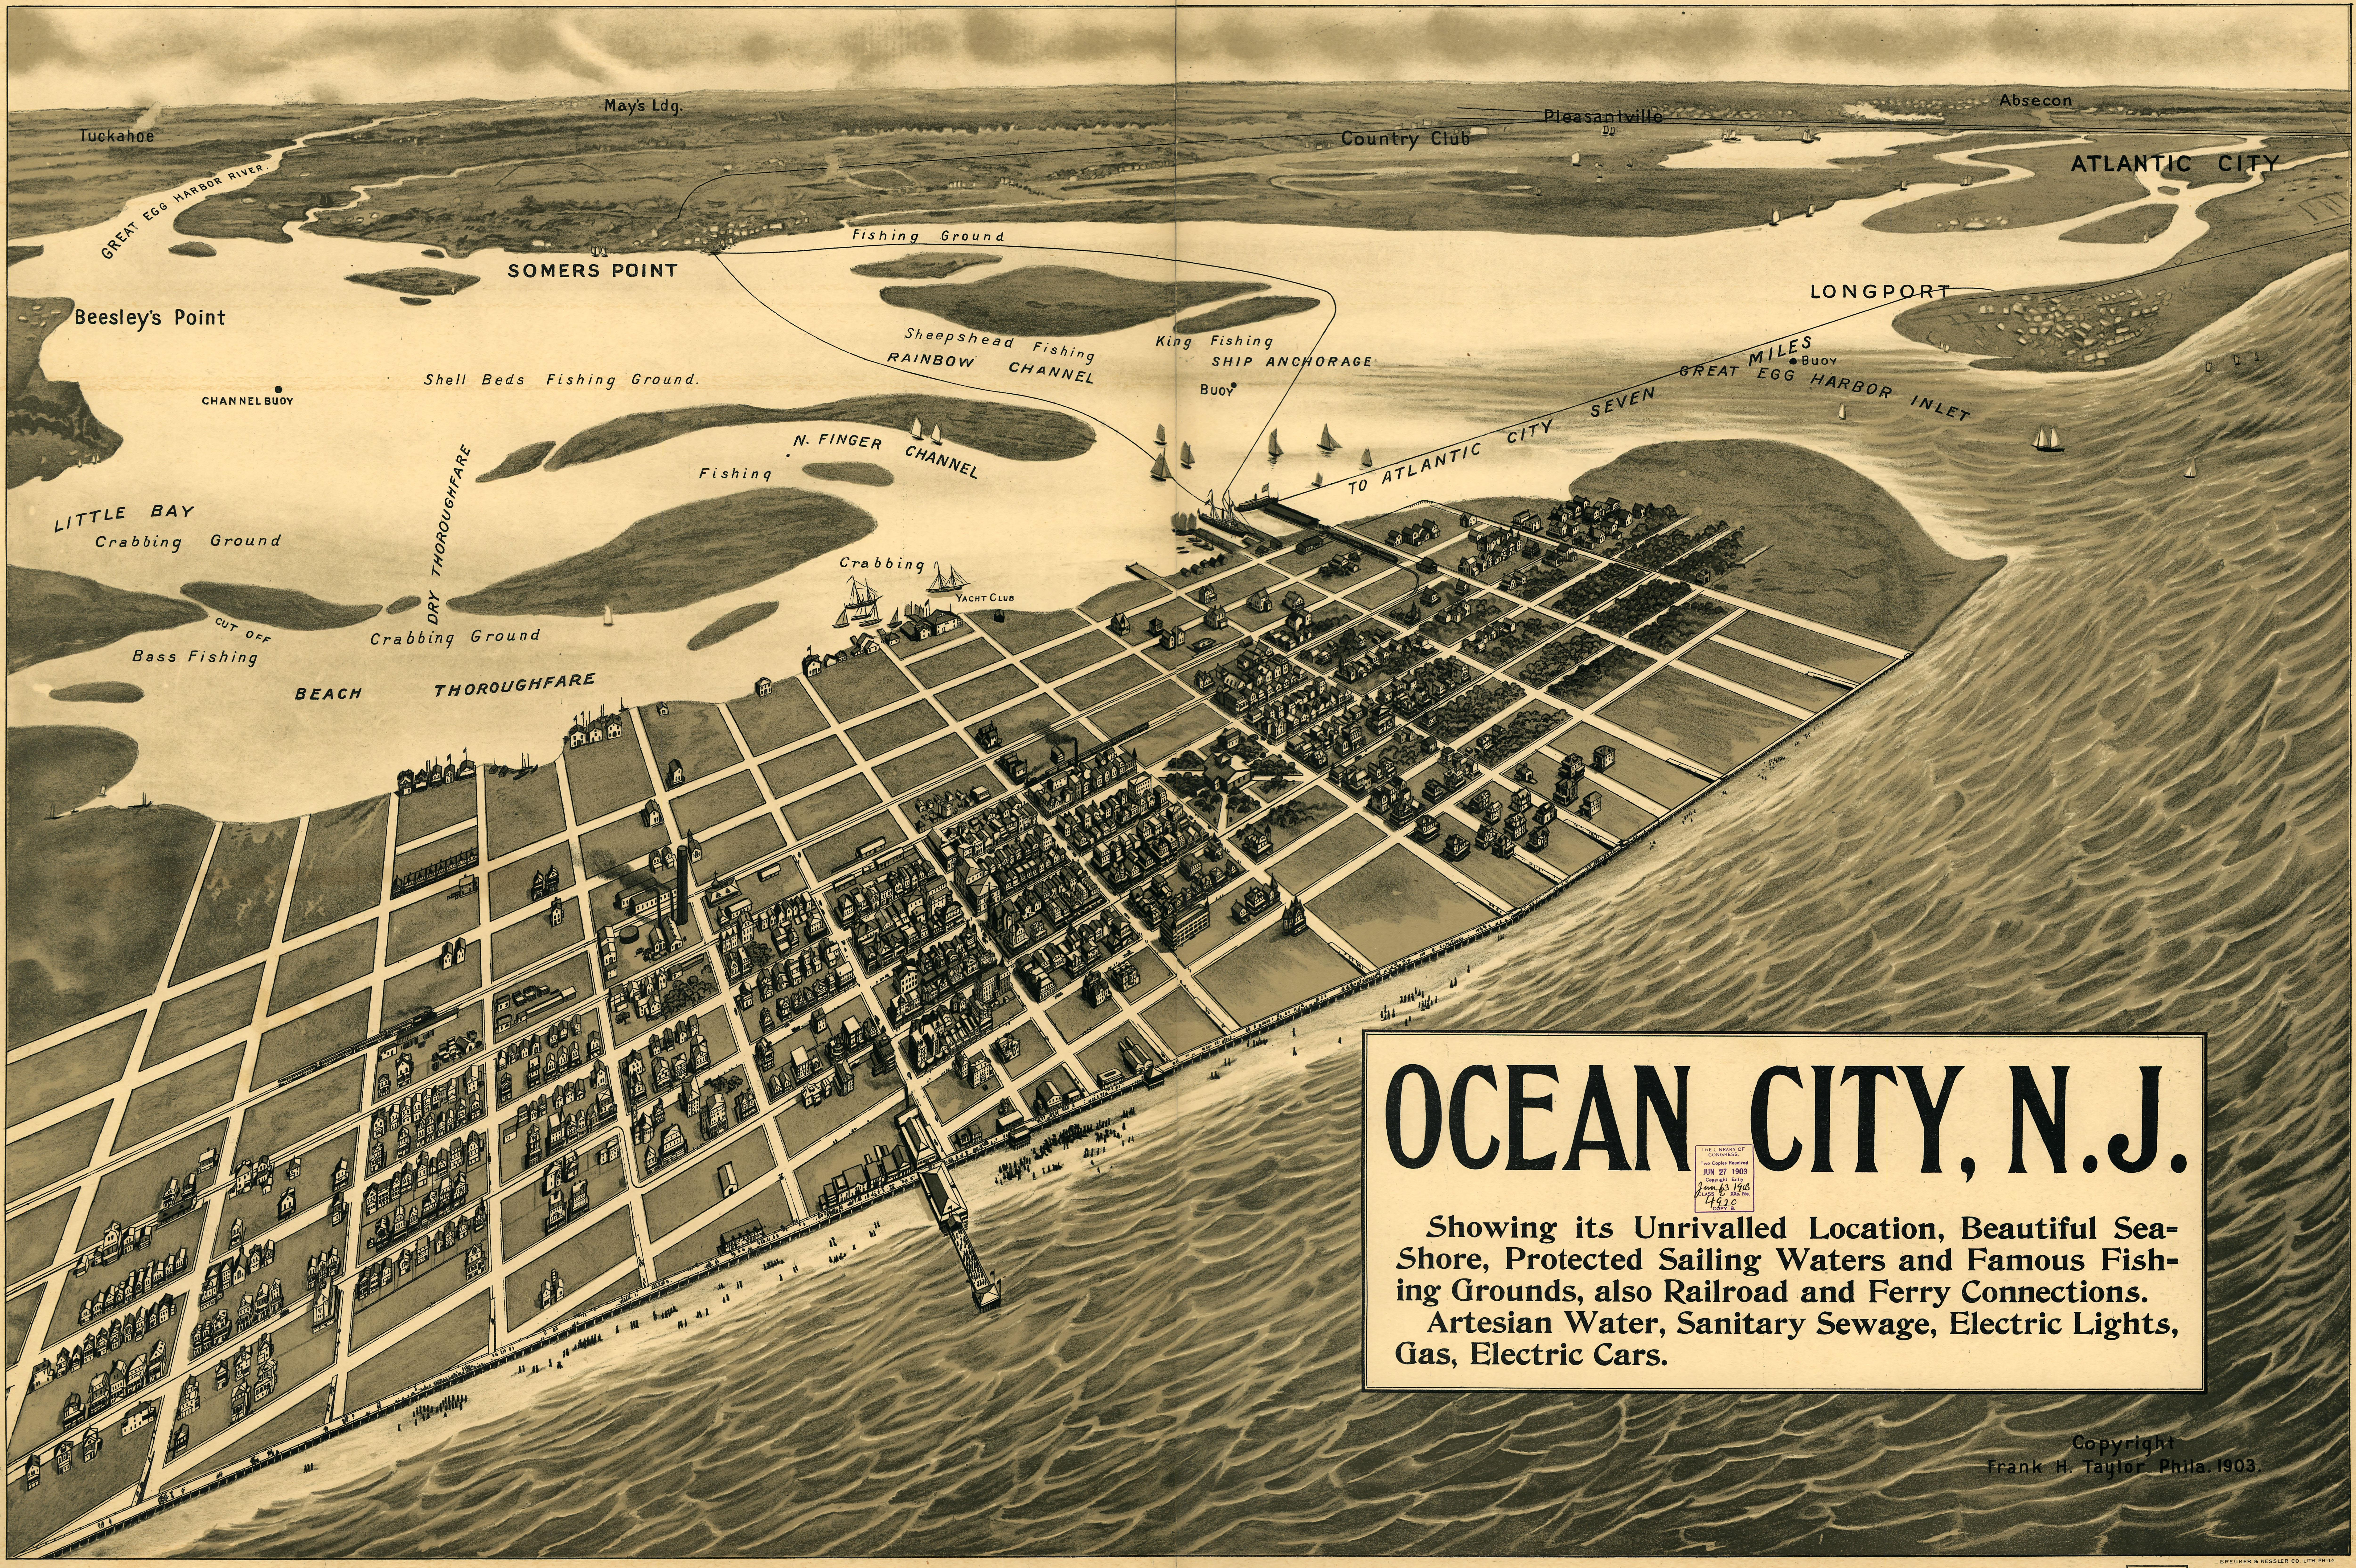 Birdseye Map of Ocean City, New Jersey (1903) on rio grande, bethany beach, ocean county nj map, long beach island nj map, ocean city boardwalk, ocean city md map, camden nj map, lbi nj map, ocean city maryland, ocean city high school, cape may, wildwood crest, ocean city parking map, sandy hook, beach haven nj map, cape may nj map, sea isle city, toms river nj map, ocean city boardwalk map, ventnor nj map, ocean city new jersey hotels, mystic island nj map, ocean county, north wildwood, avalon nj map, toms river, long beach island, cherry hill township nj map, seaside park nj map, point pleasant nj map, jersey city, ocean city new jersey streets, stone harbor, ocnj street map, atlantic city, asbury park, cape may county,